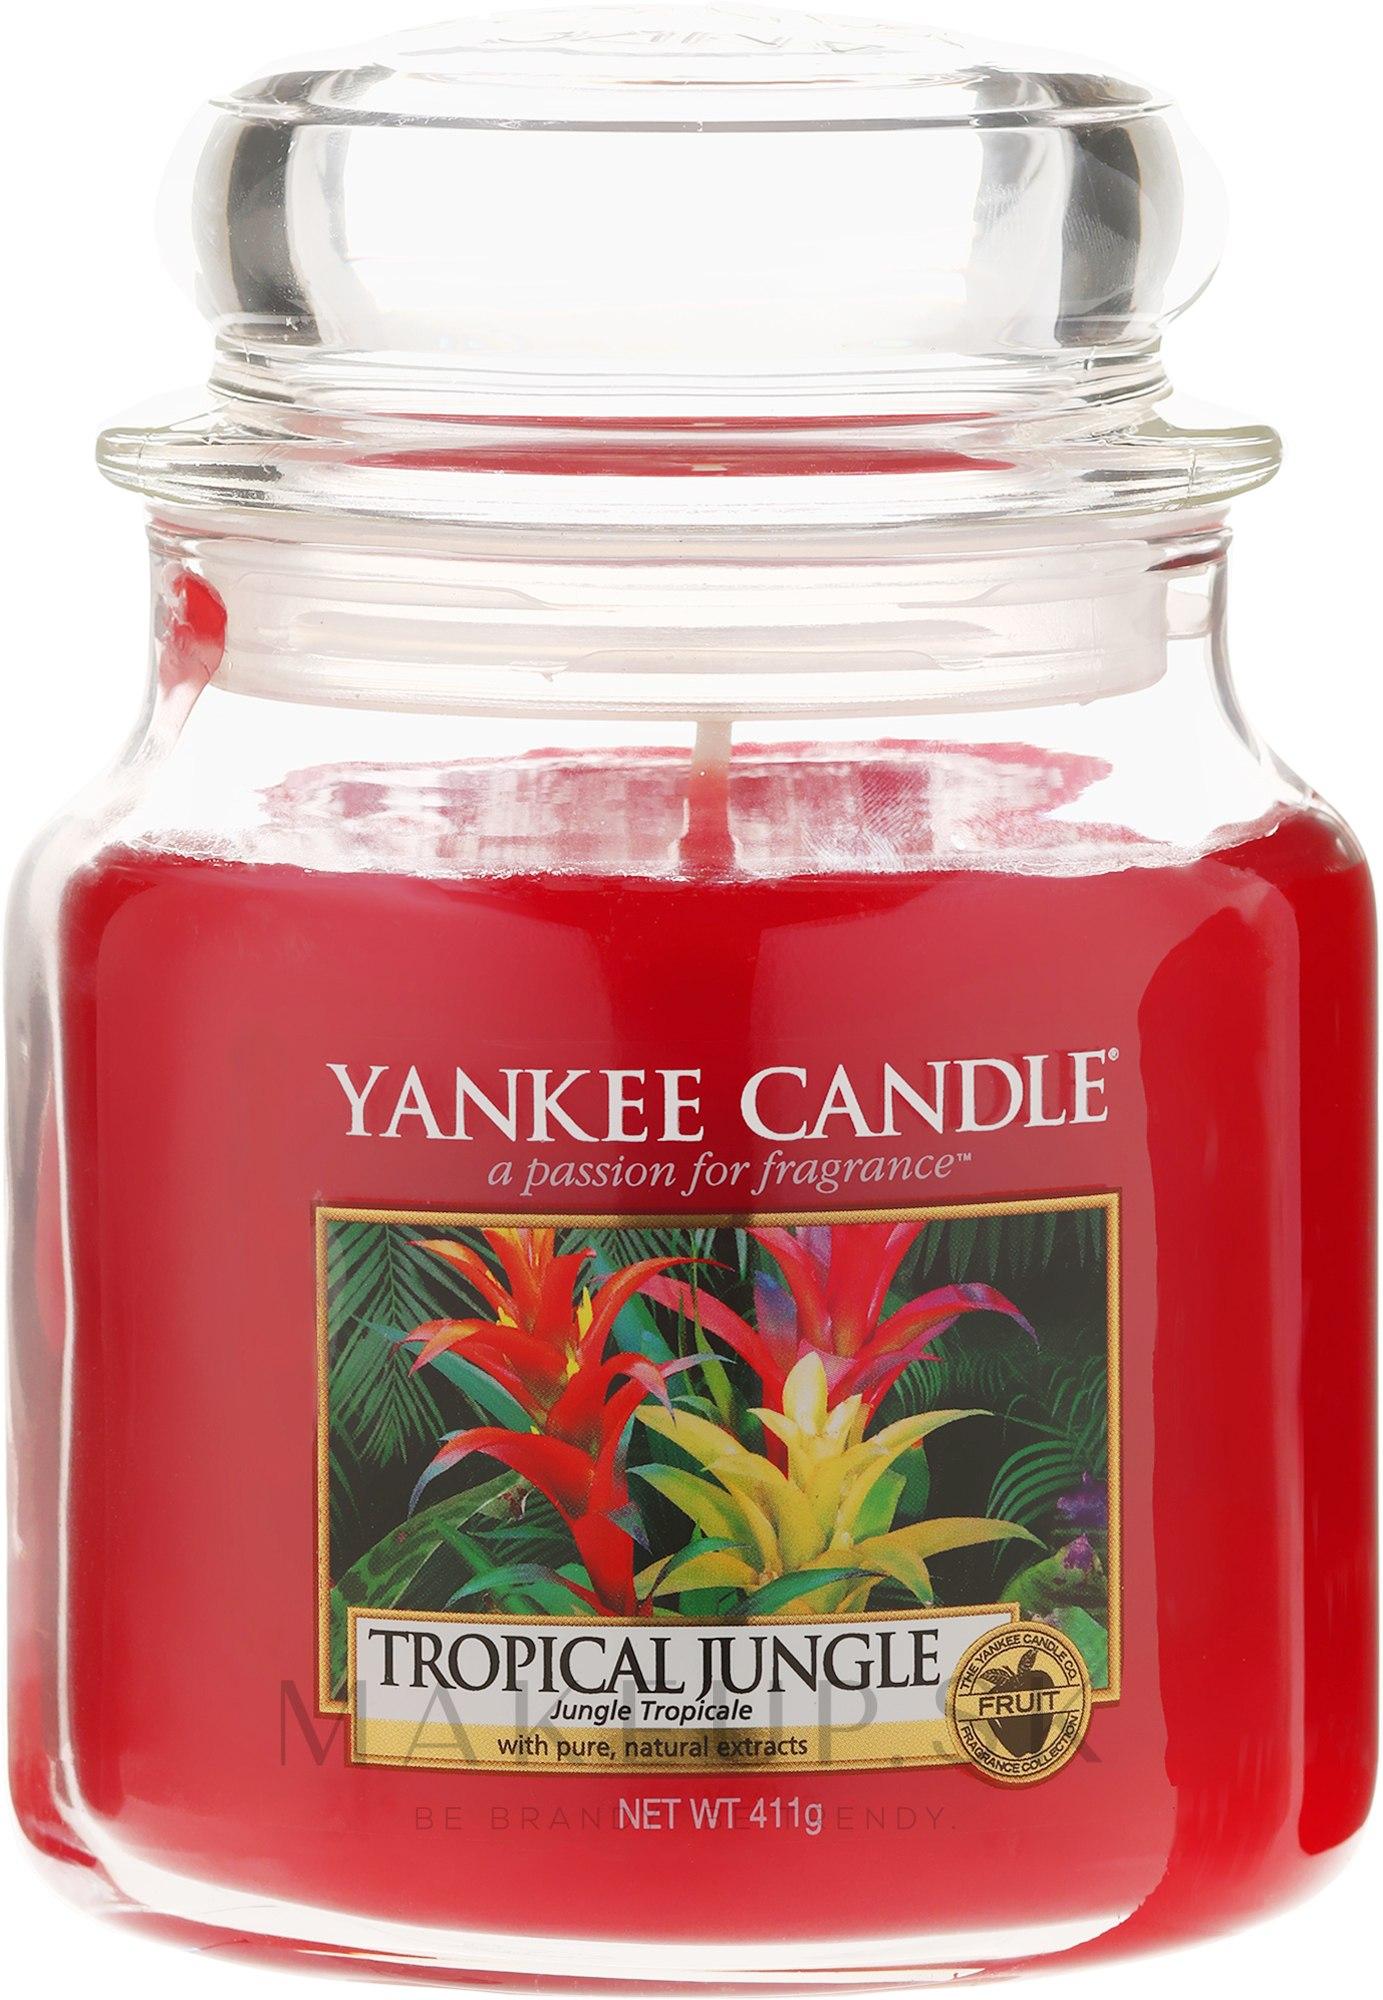 Vonná sviečka v plechovke - Yankee Candle Tropical Jungle — Obrázky 411 g